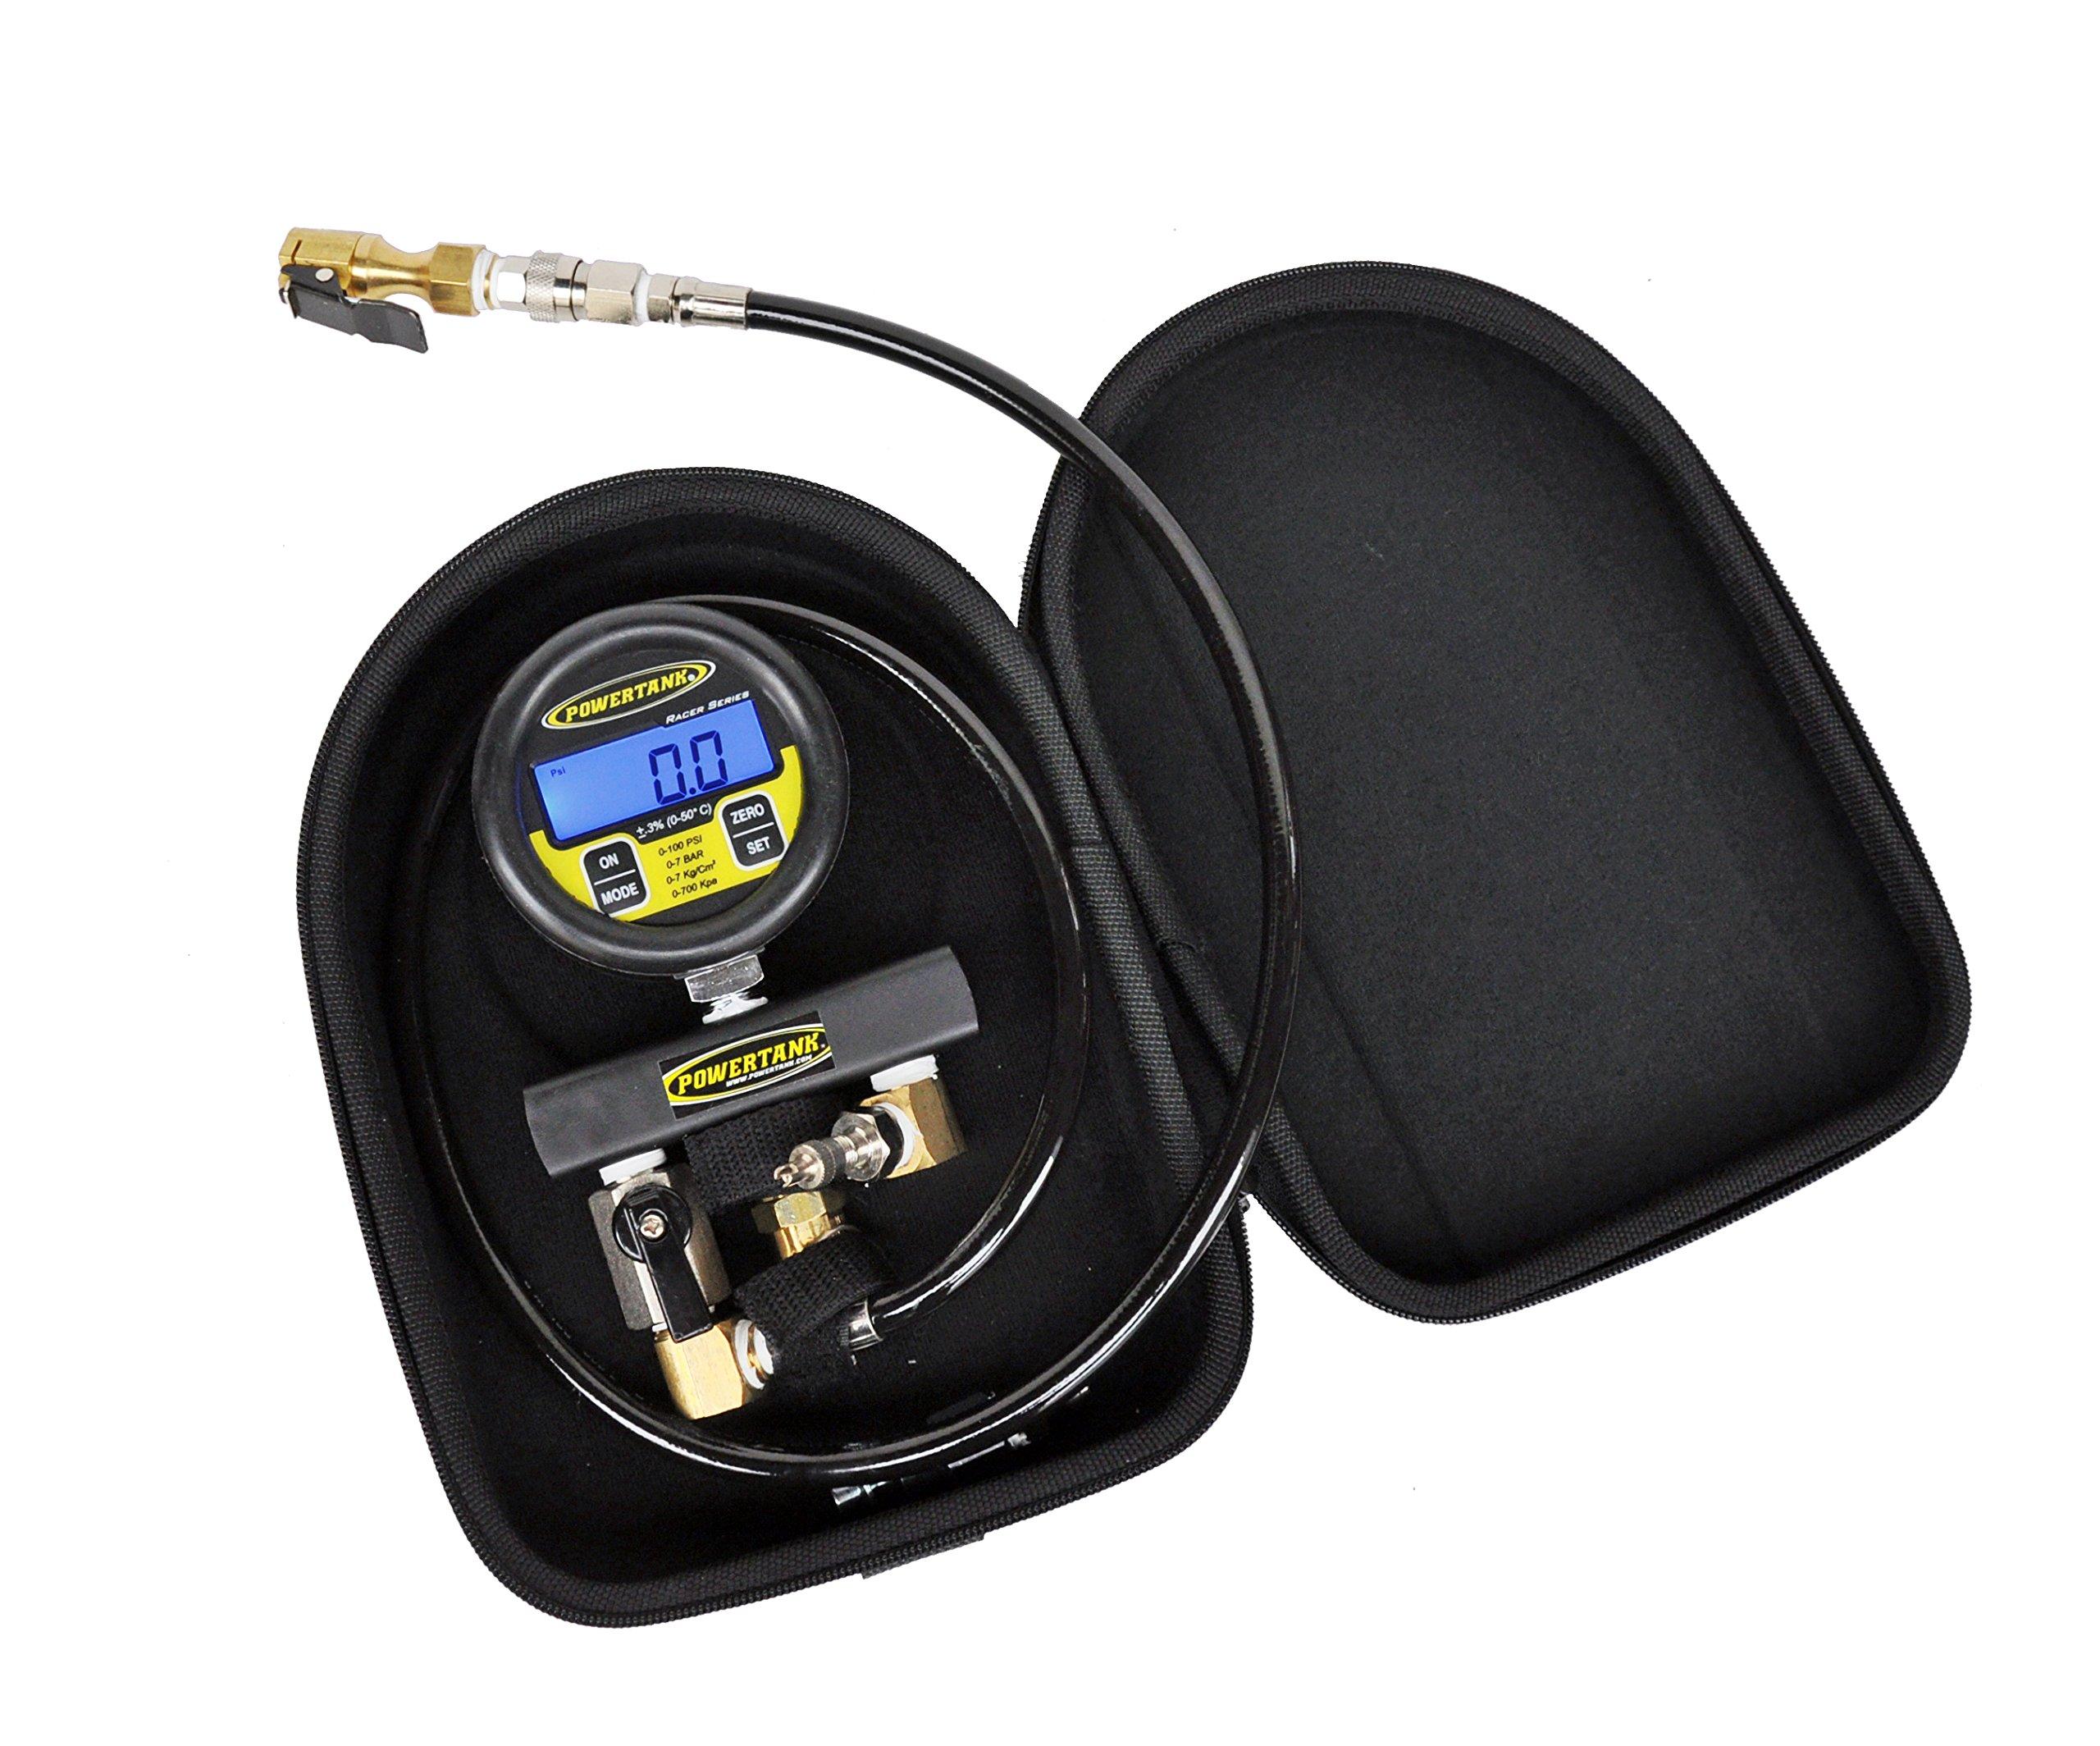 Power Tank PPG-R100 Racer Series 0-100 PSI Digital Tire Pressure/Test Gauge